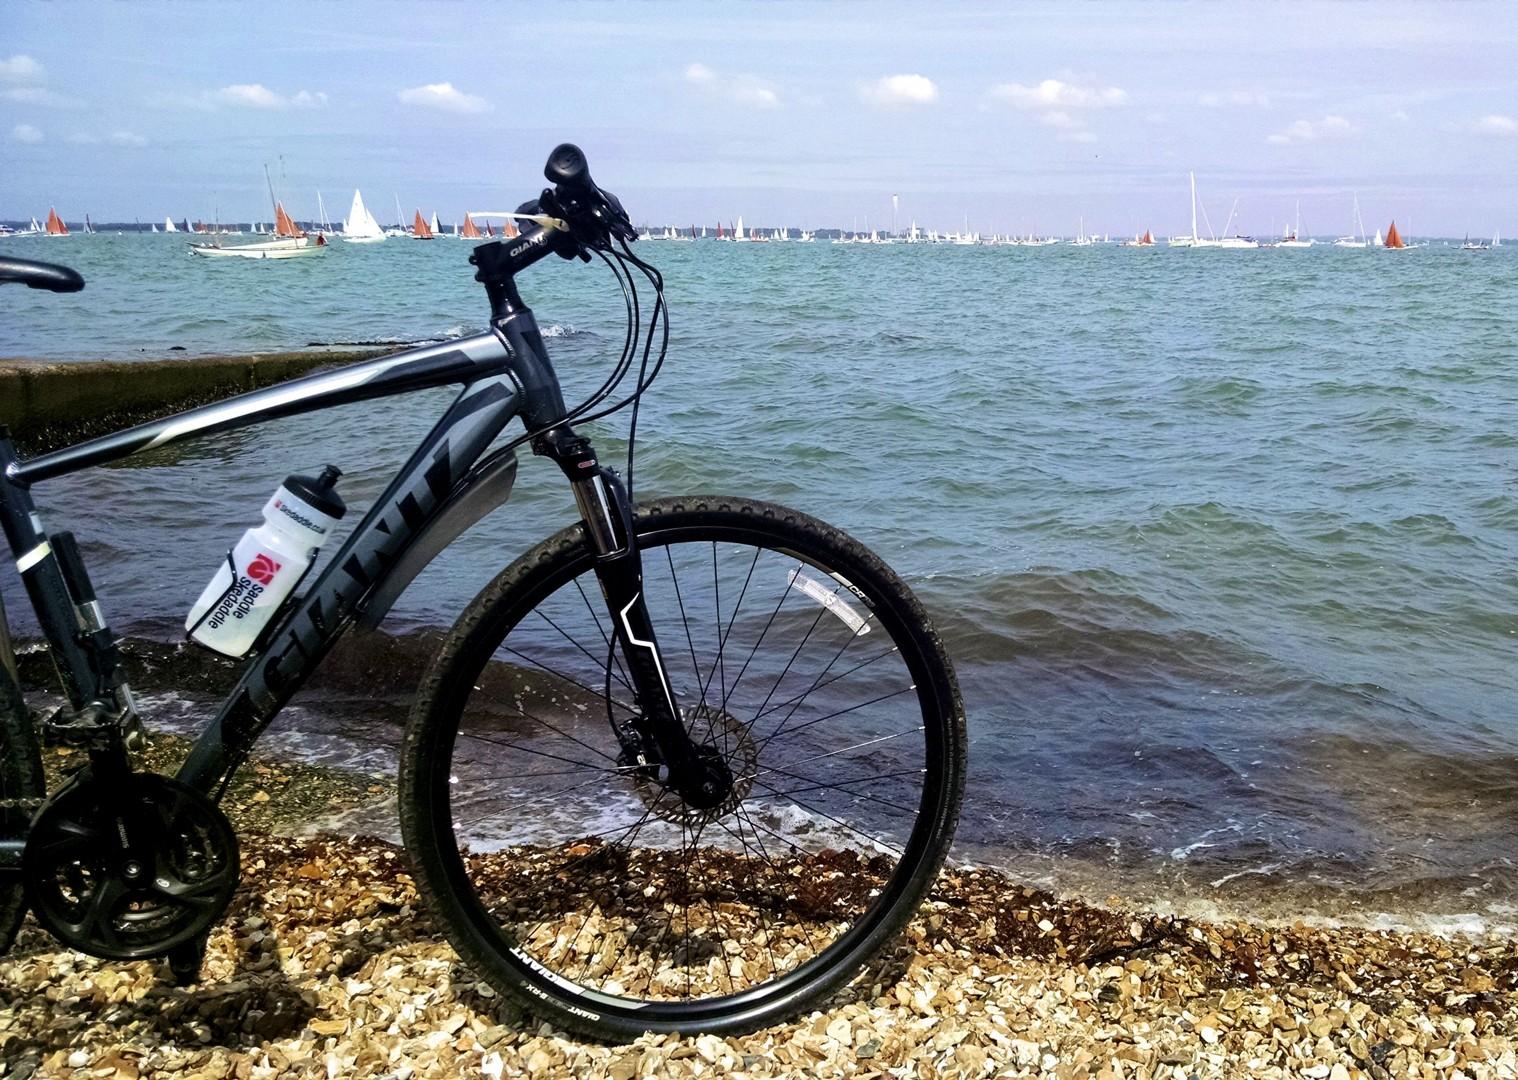 leisure-cycling-holiday-uk-isleofwight-coast.jpg - UK - Isle of Wight - Freshwater Bay - Self-Guided Leisure Cycling Holiday - Leisure Cycling